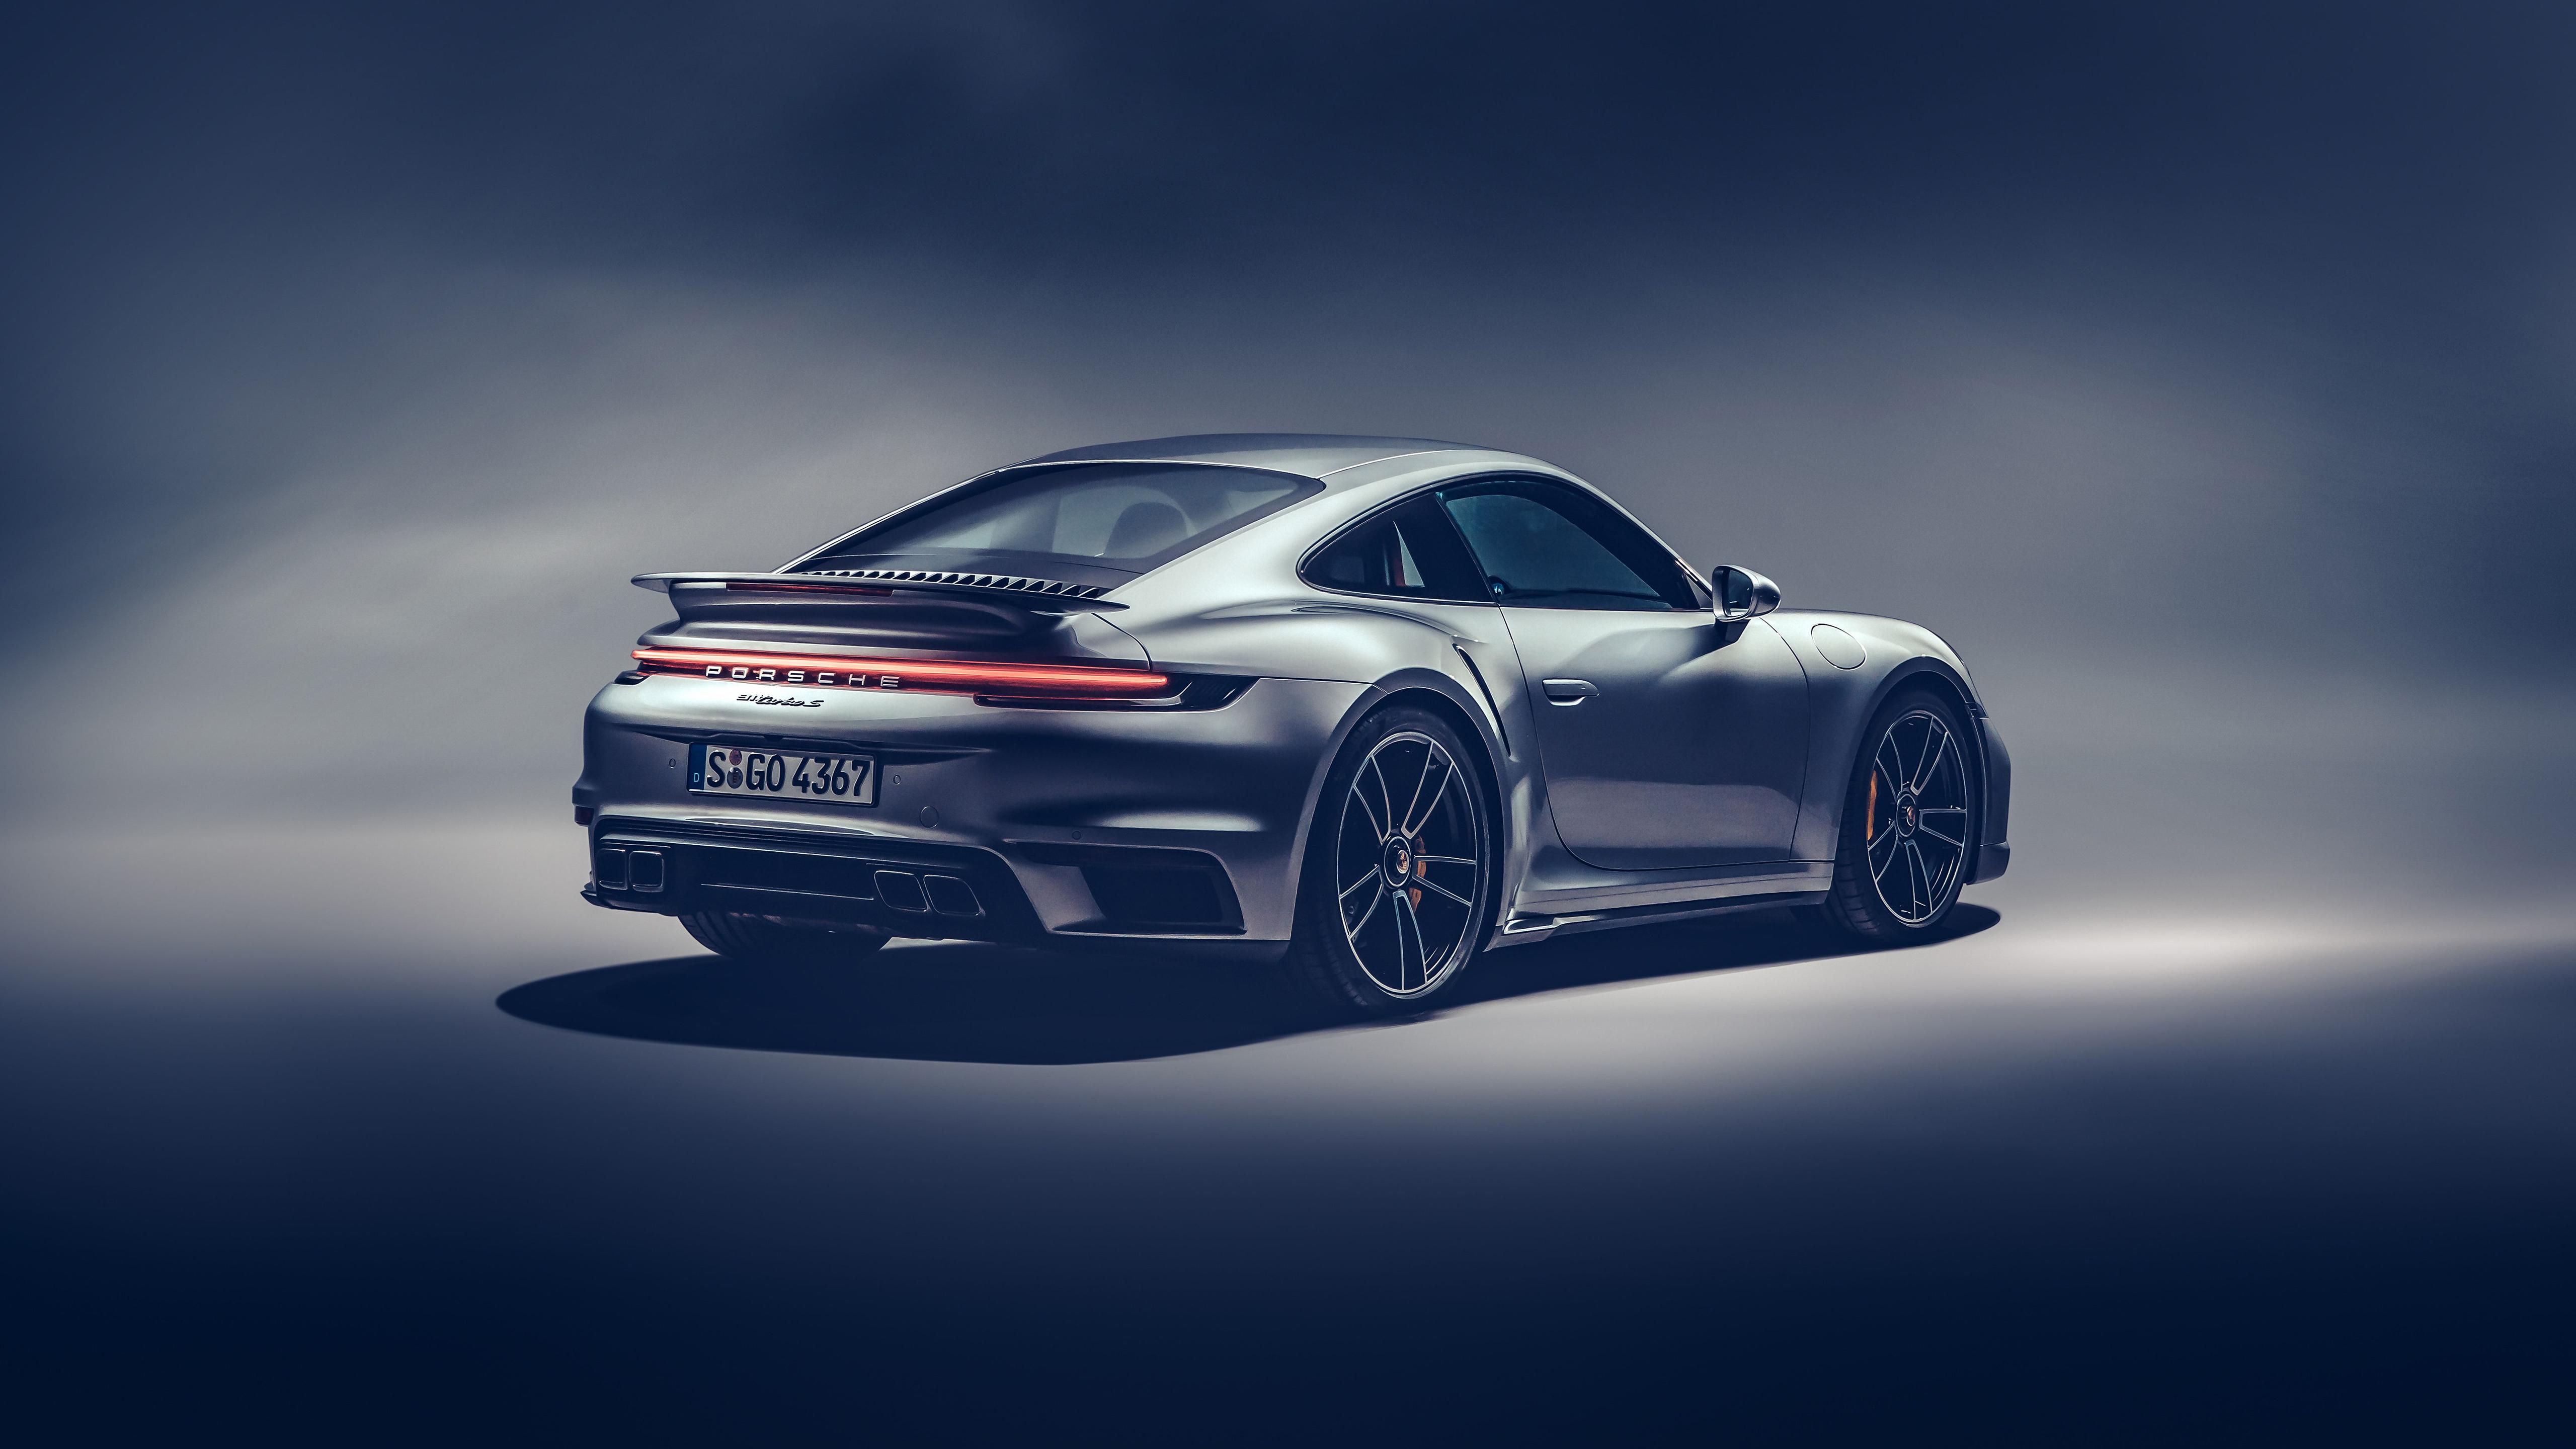 Porsche 911 Turbo S 2020 5K 3 Wallpaper HD Car Wallpapers ID 5120x2880